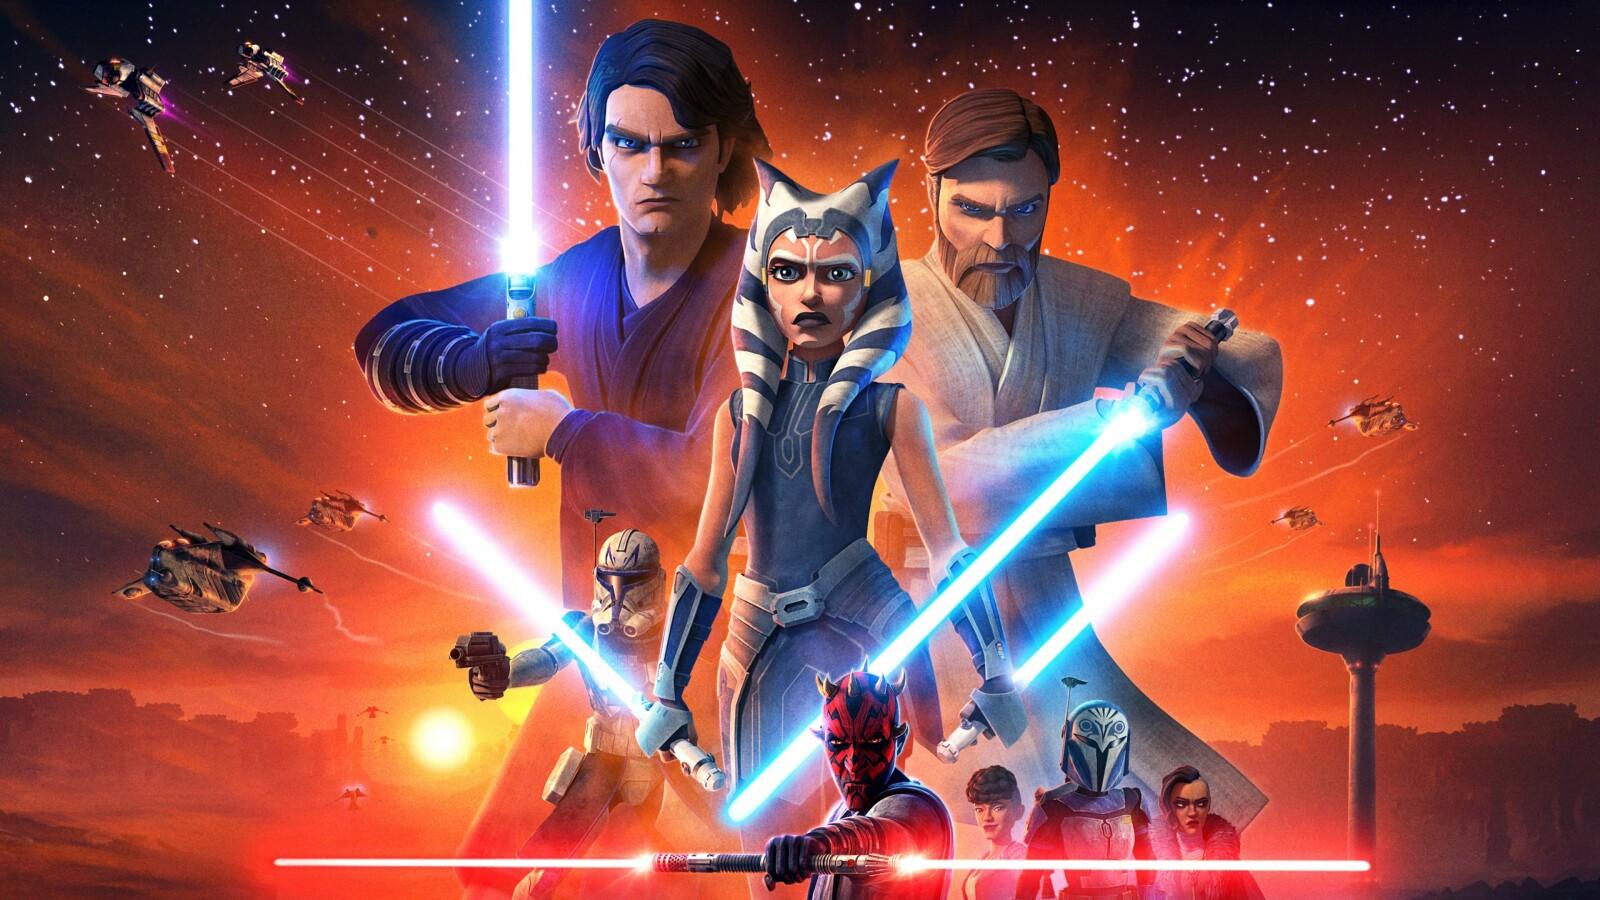 Star Wars Episodenguide